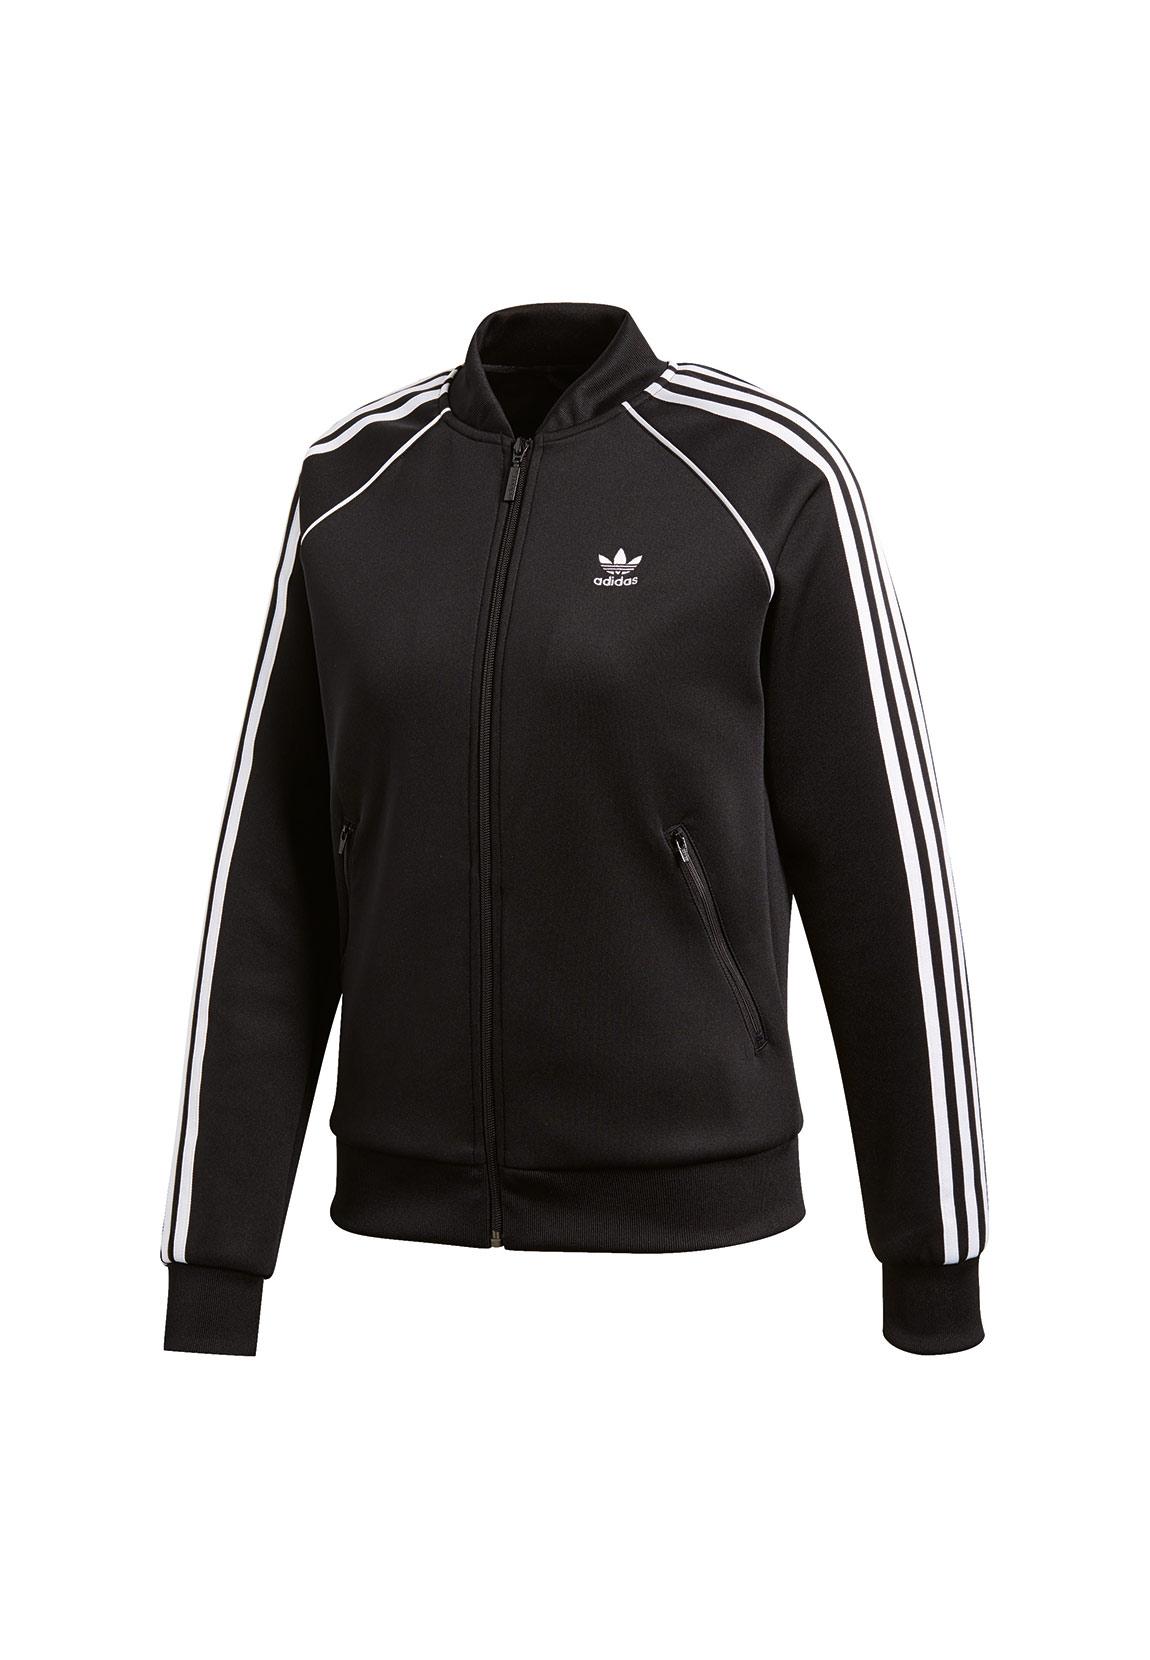 adidas originals damen sweatjacke sst tt ce2392 schwarz damen sweater hoodies. Black Bedroom Furniture Sets. Home Design Ideas